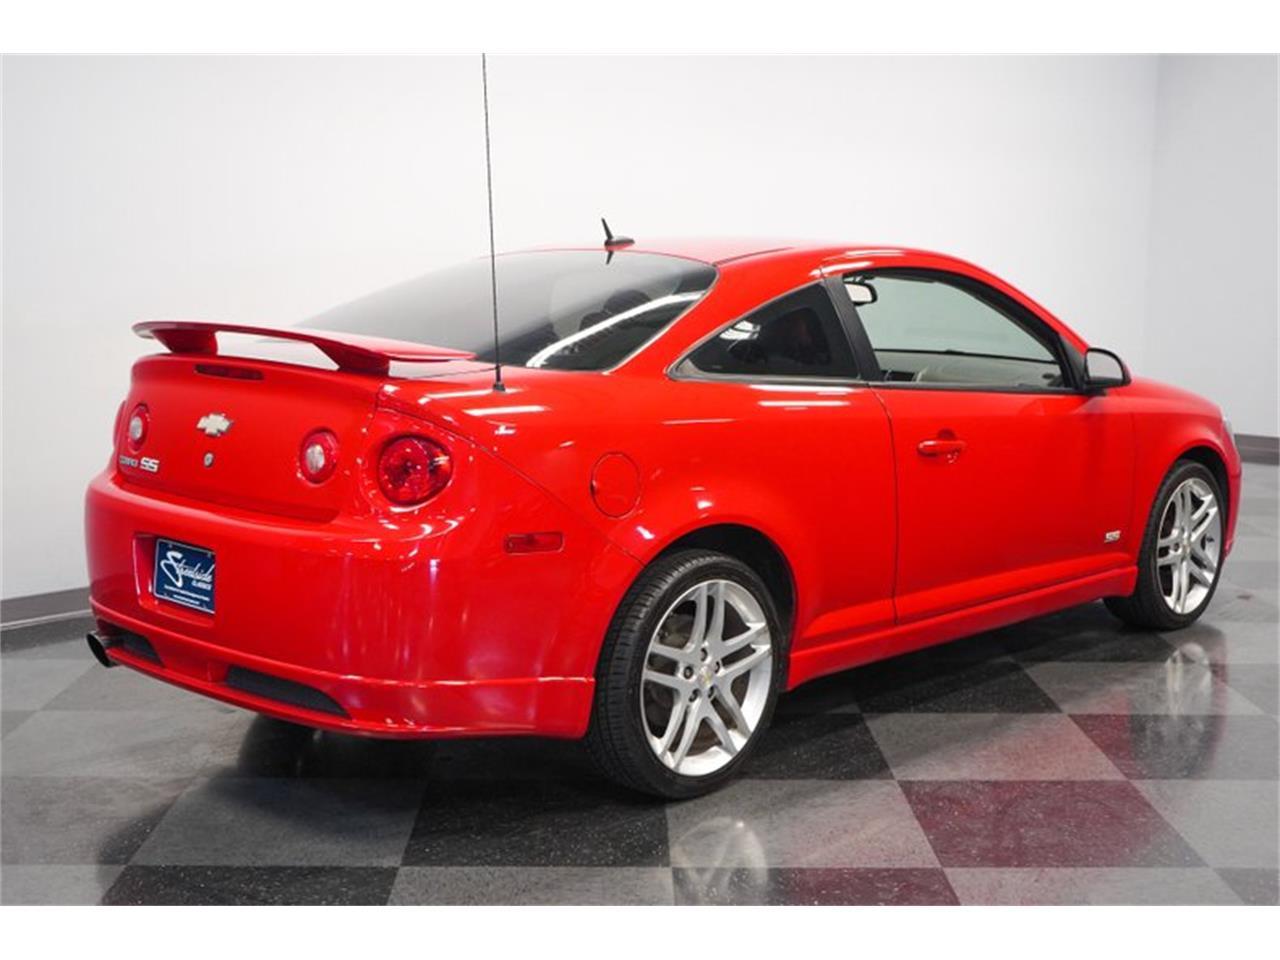 2009 Chevrolet Cobalt (CC-1343906) for sale in Mesa, Arizona